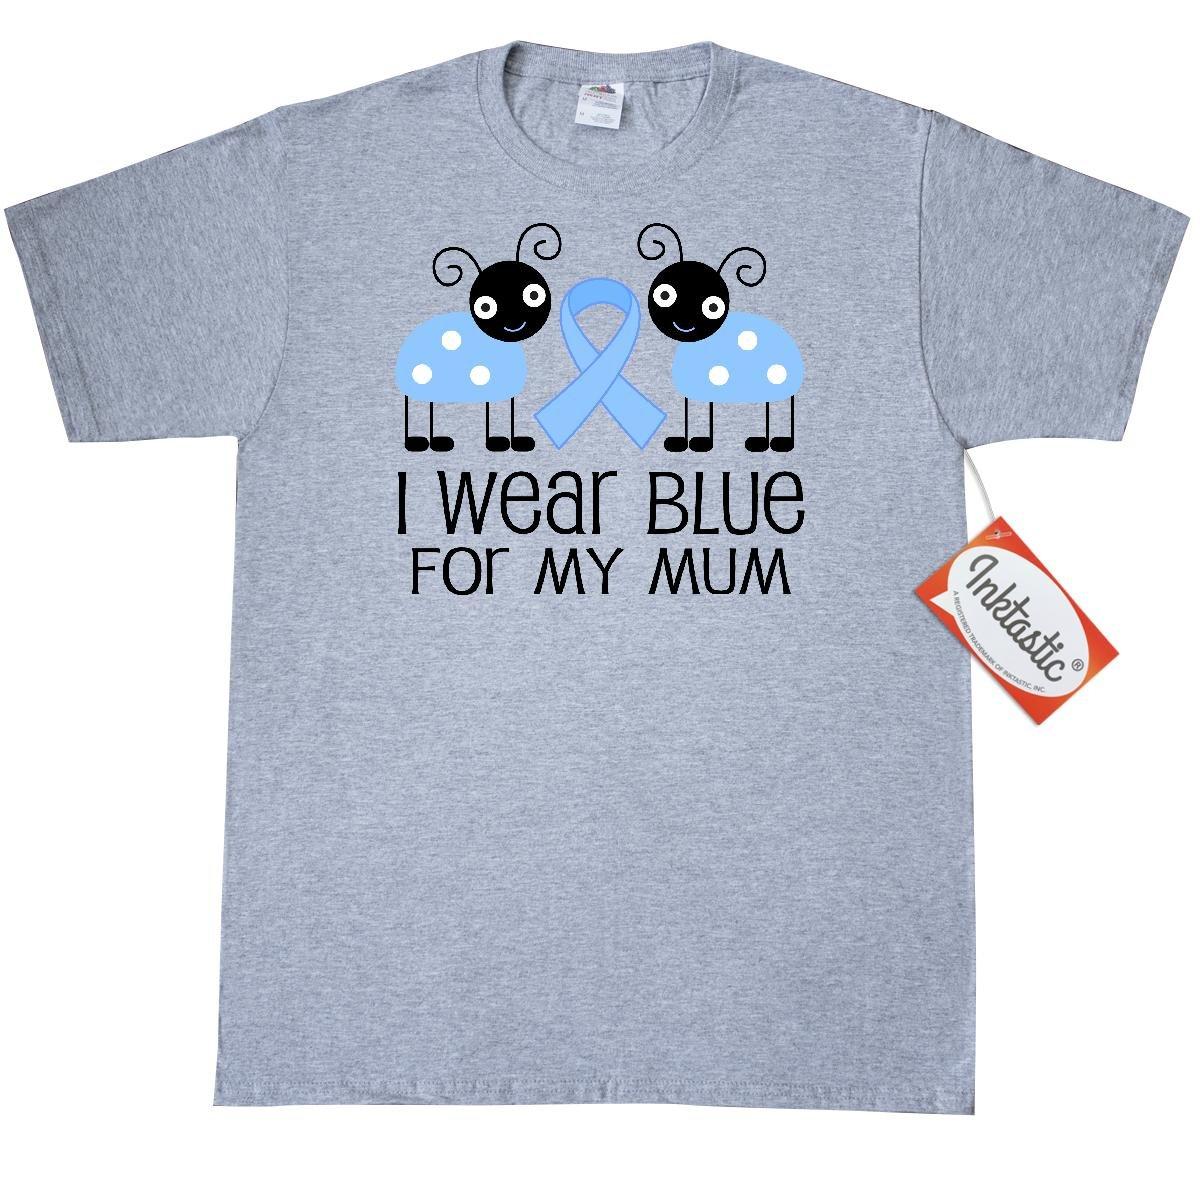 Amazon.com: Inktastic Light Blue Awareness Ribbon For My Mum ...